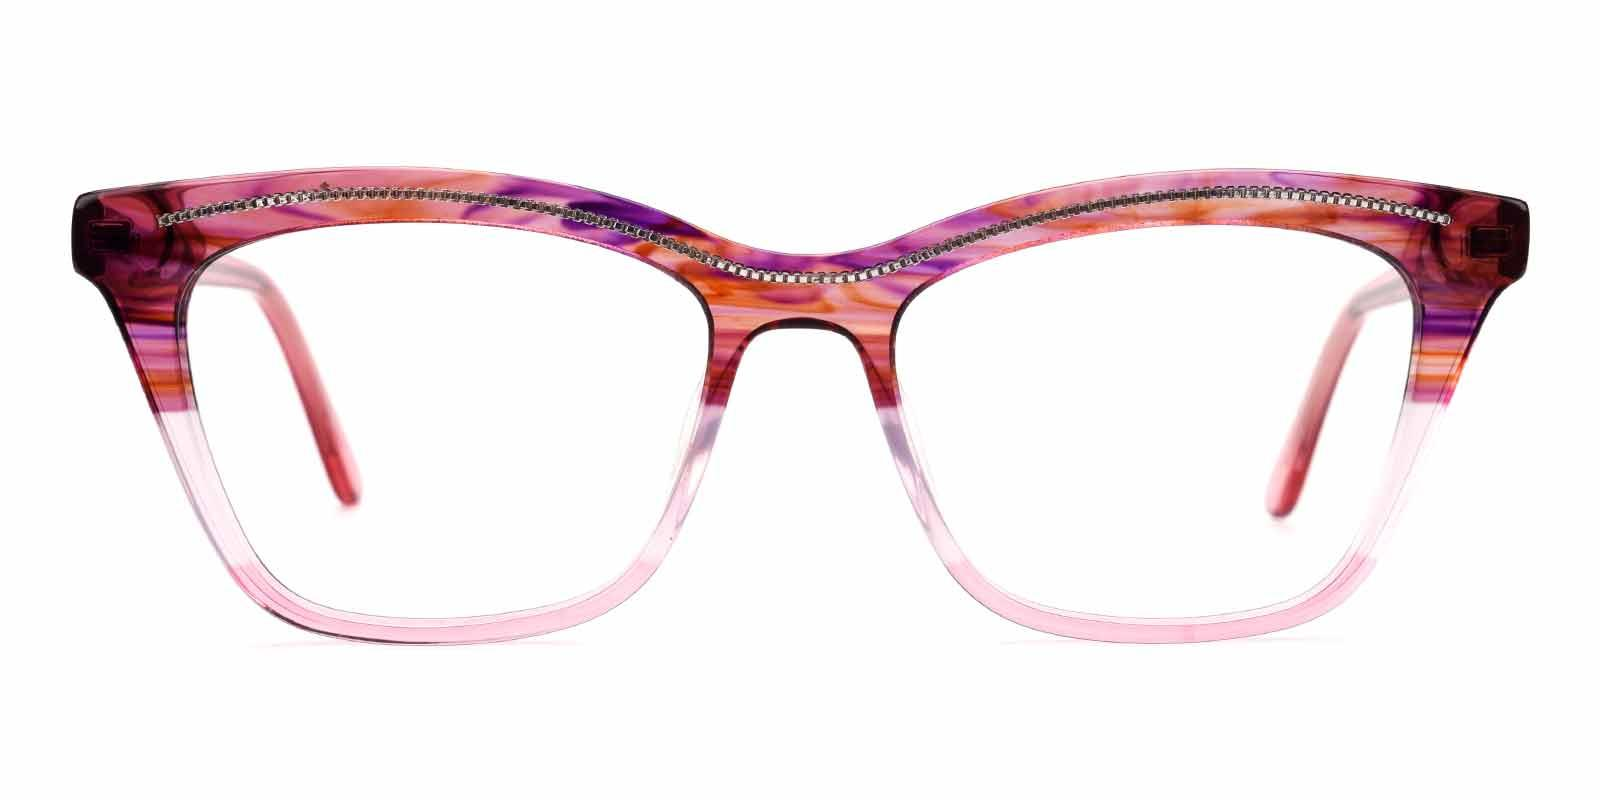 Tina-Red-Browline-Acetate-Eyeglasses-additional2